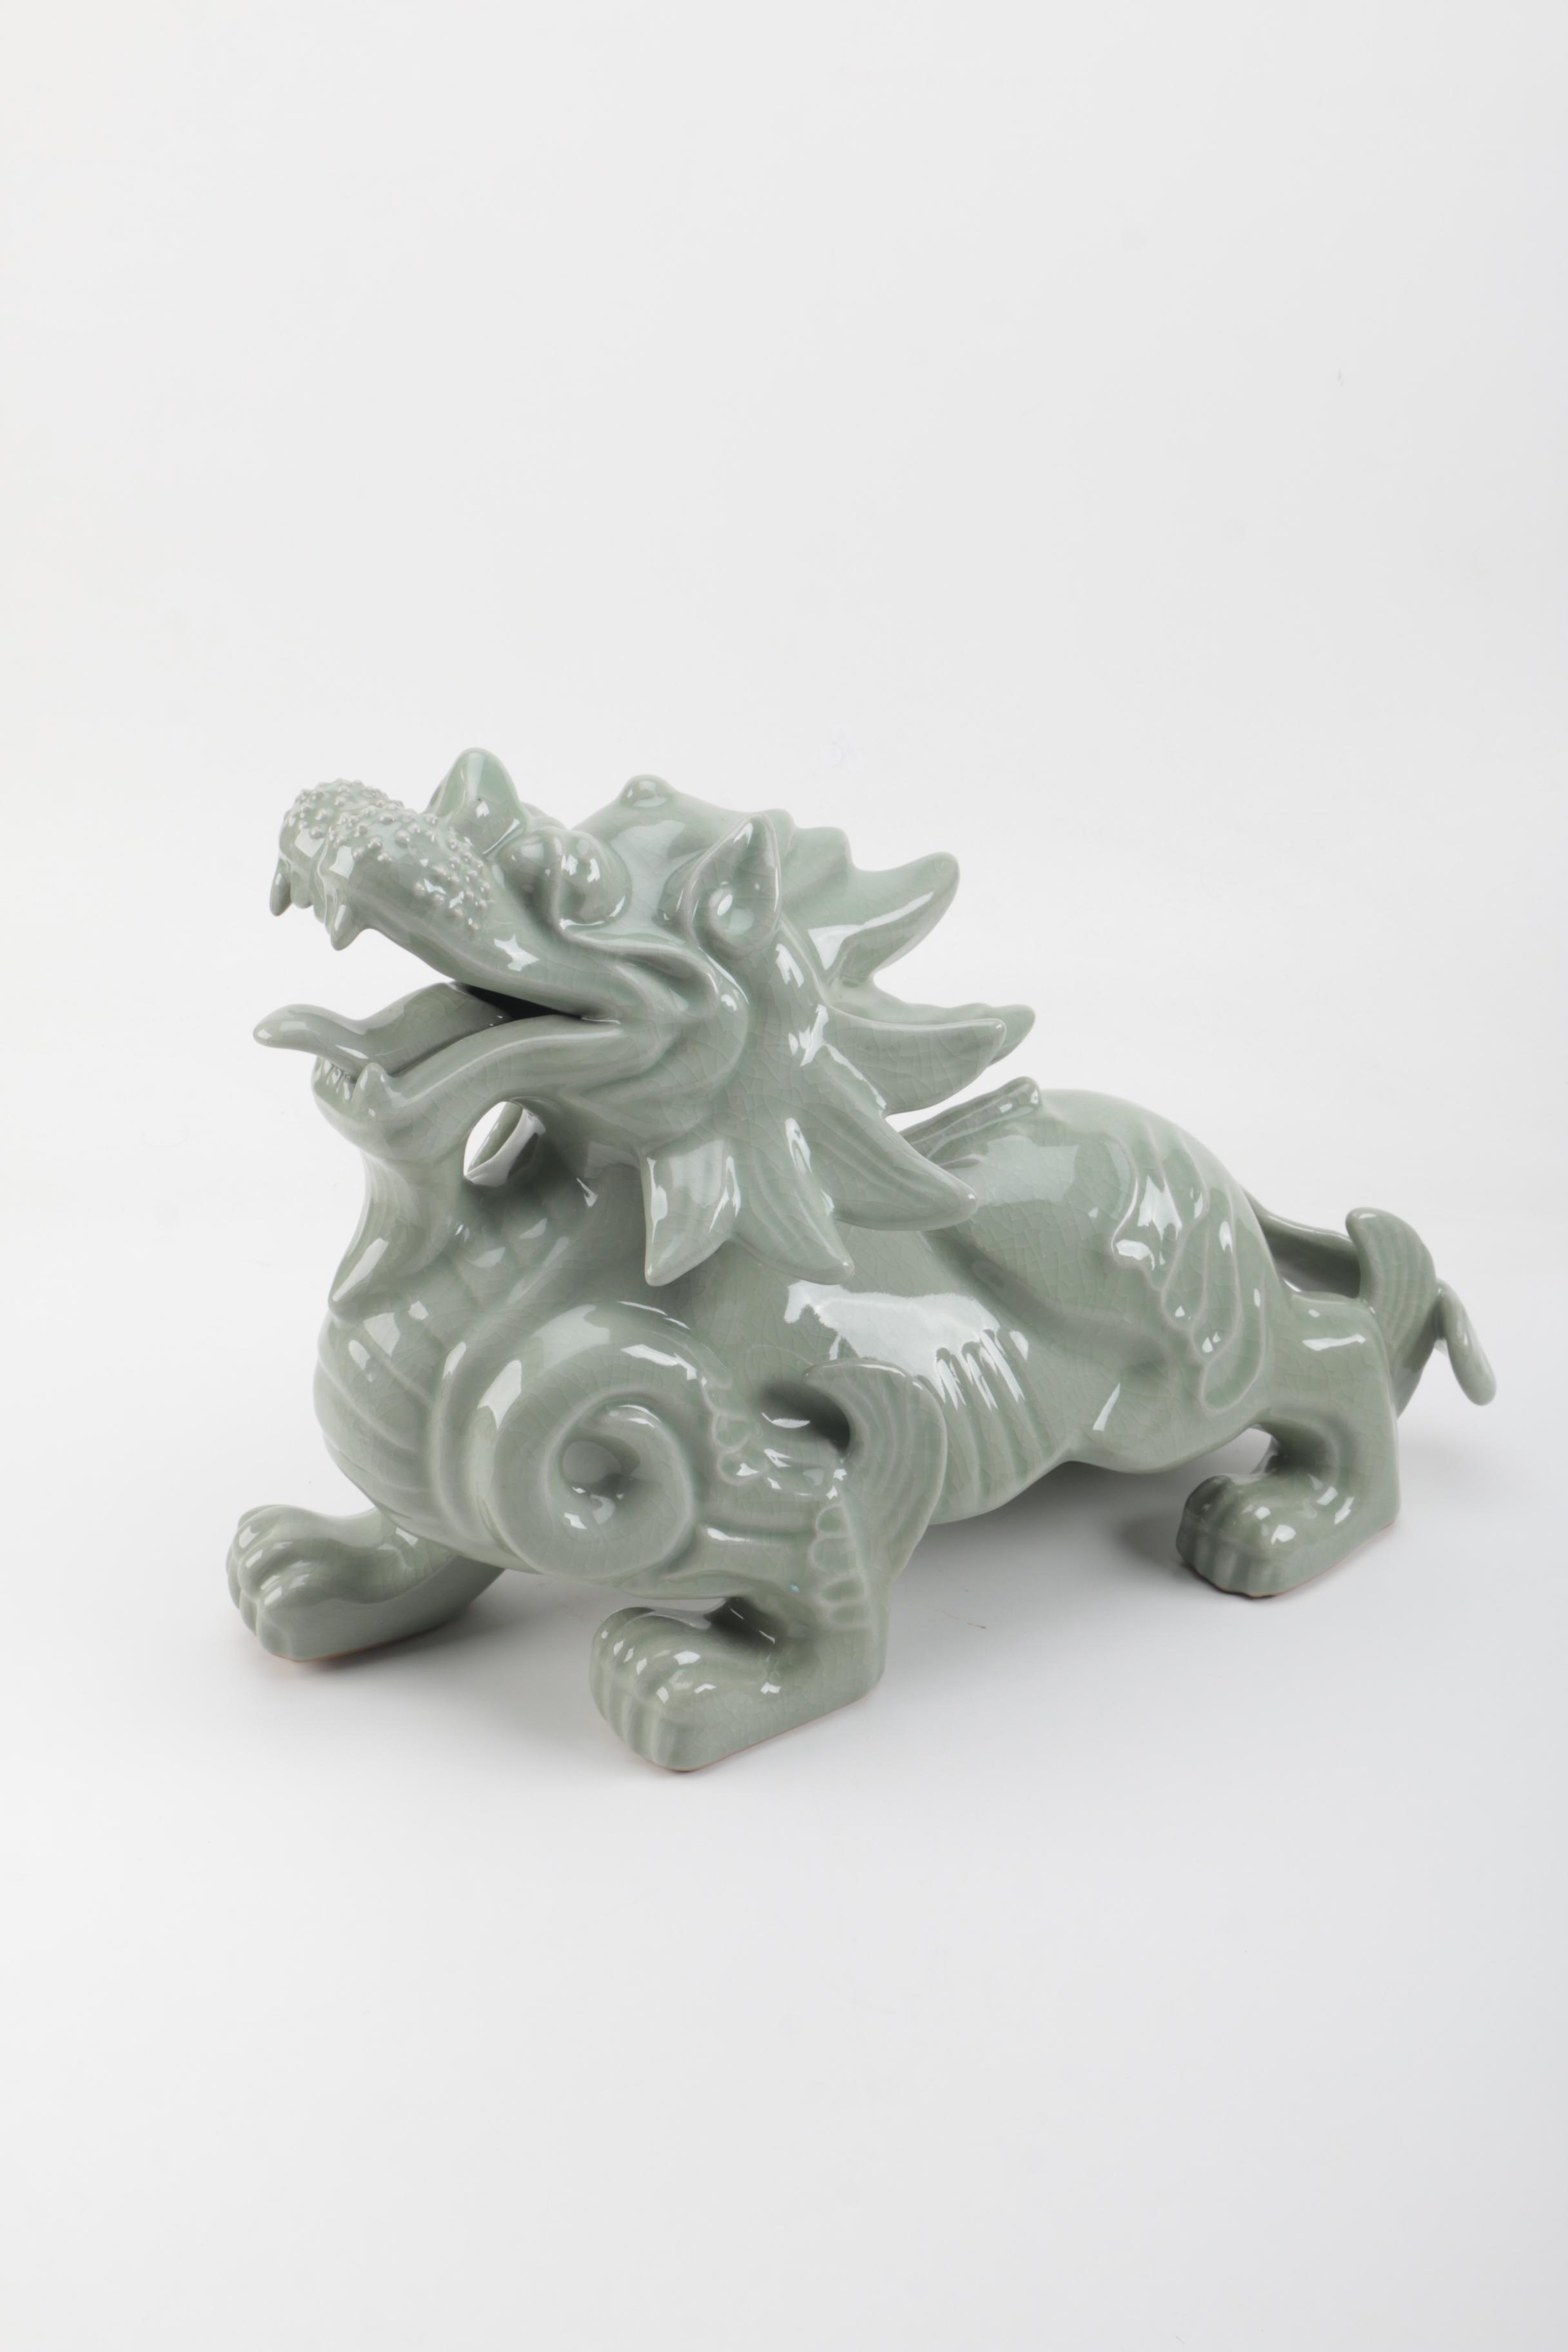 Decorative Ceramic Dragon